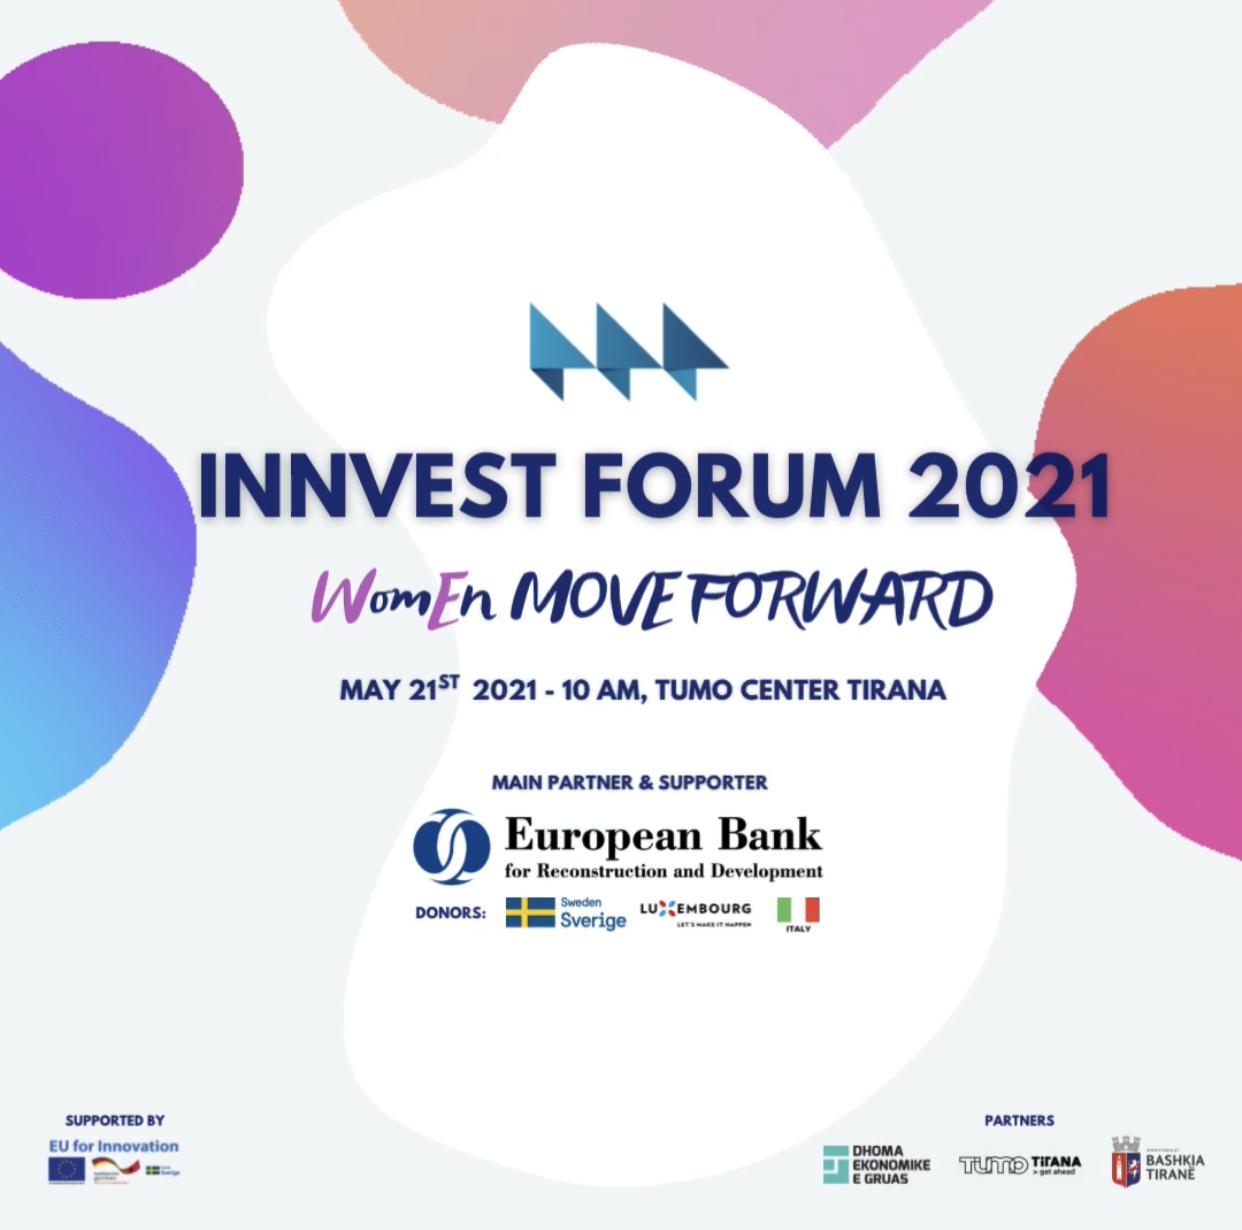 INNVEST Forum 2021